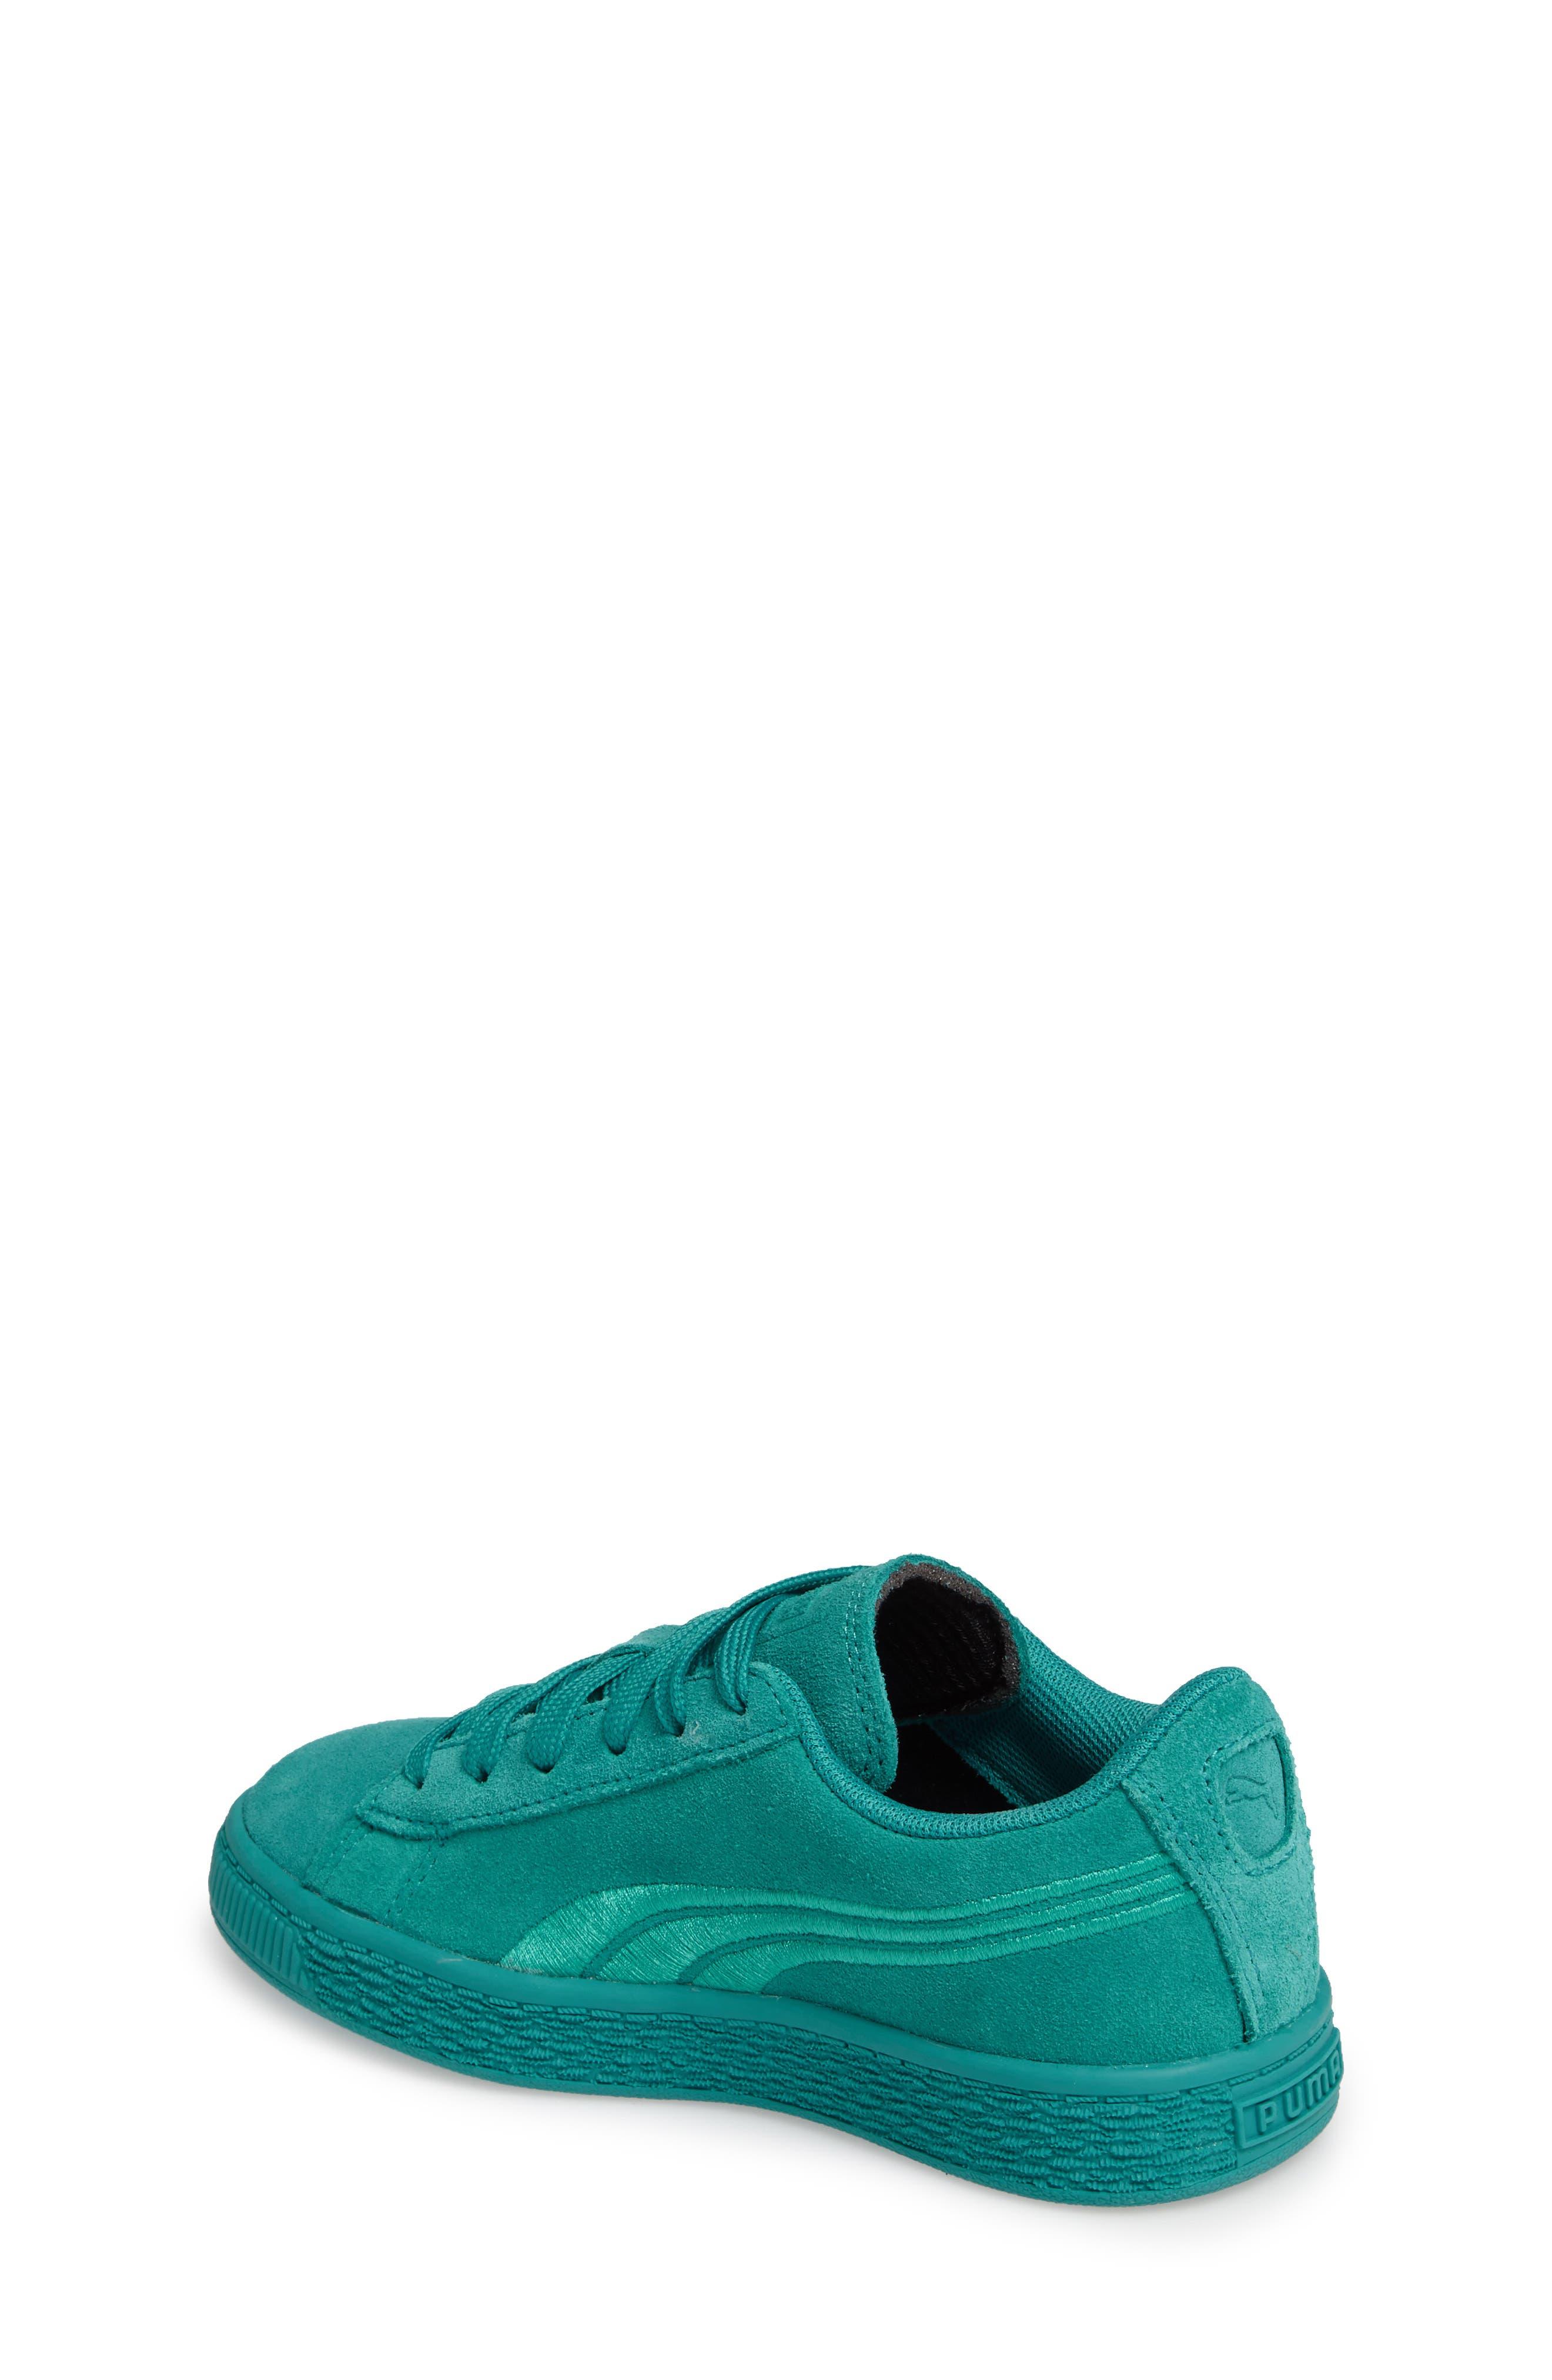 Classic Badge Sneaker,                             Alternate thumbnail 2, color,                             300